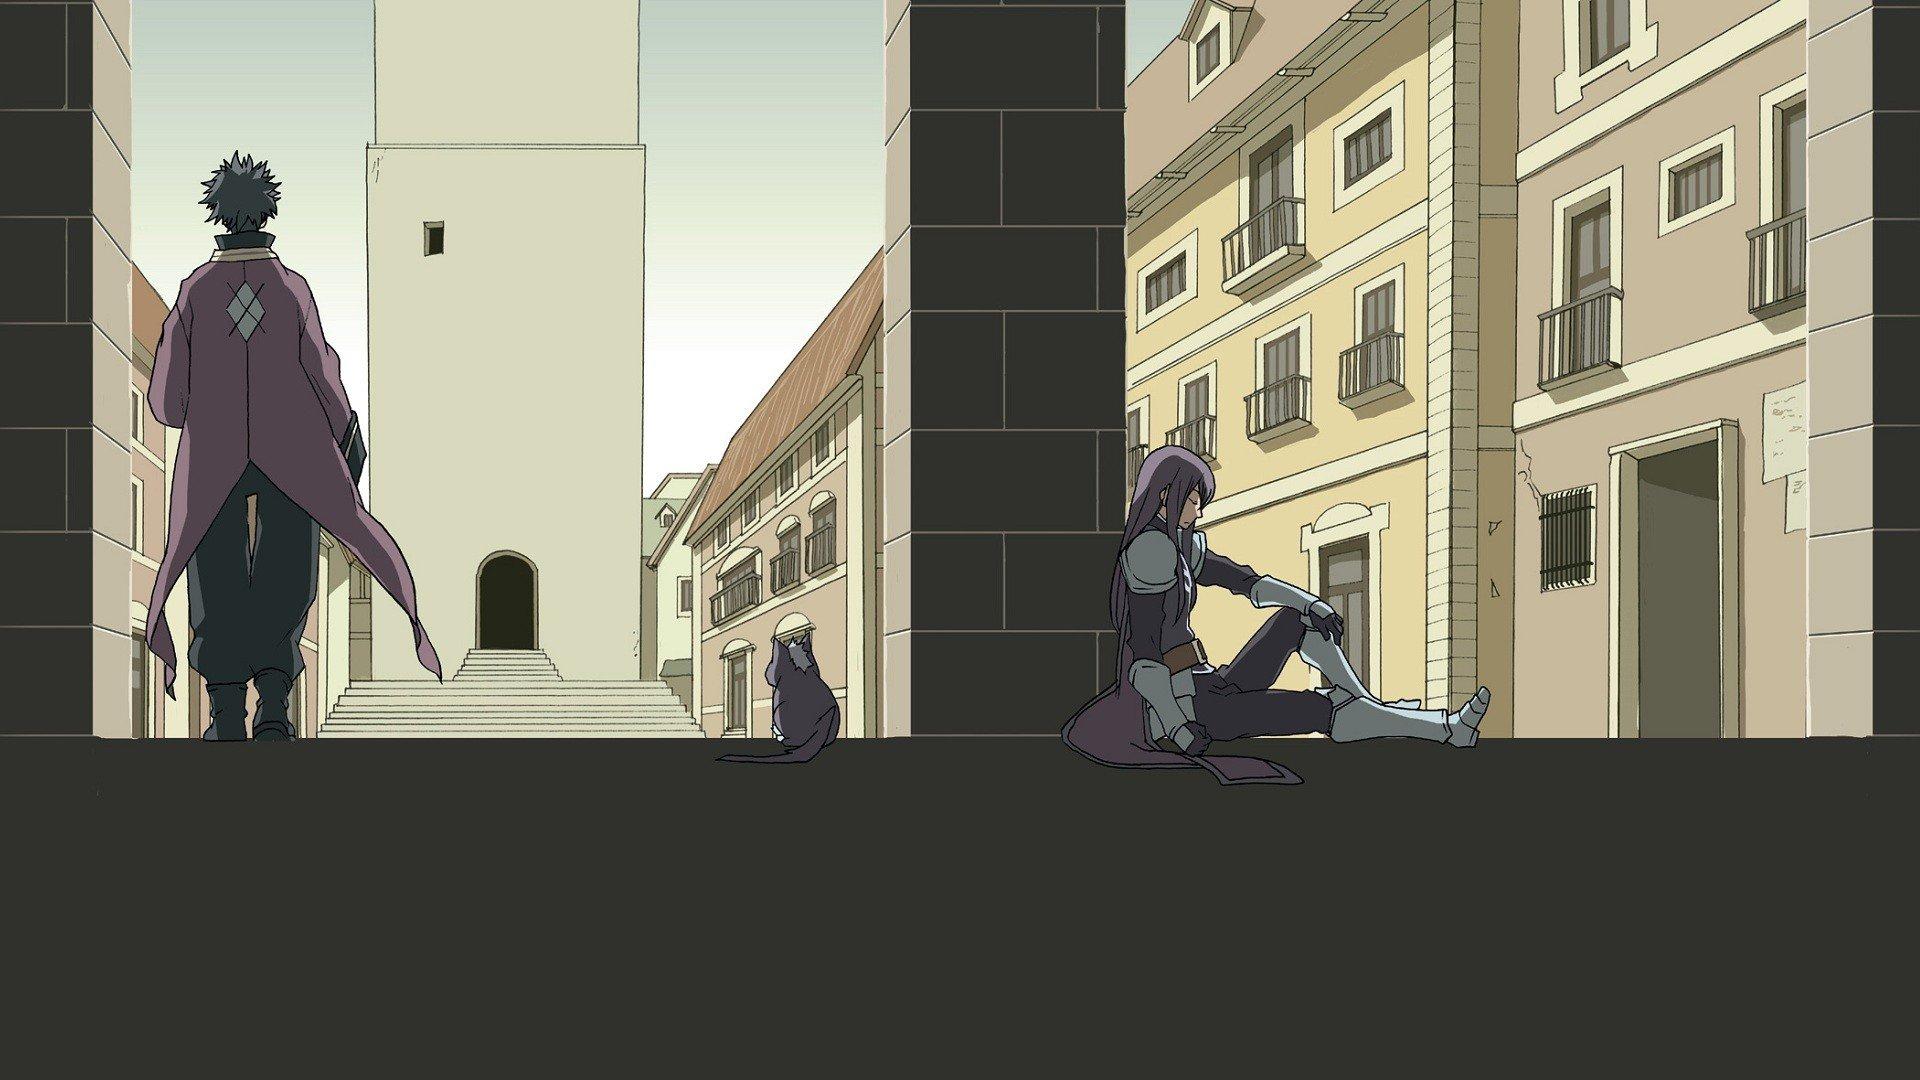 Raven Character Video Games Tales Of Vesperia Yuri Lowell Repede